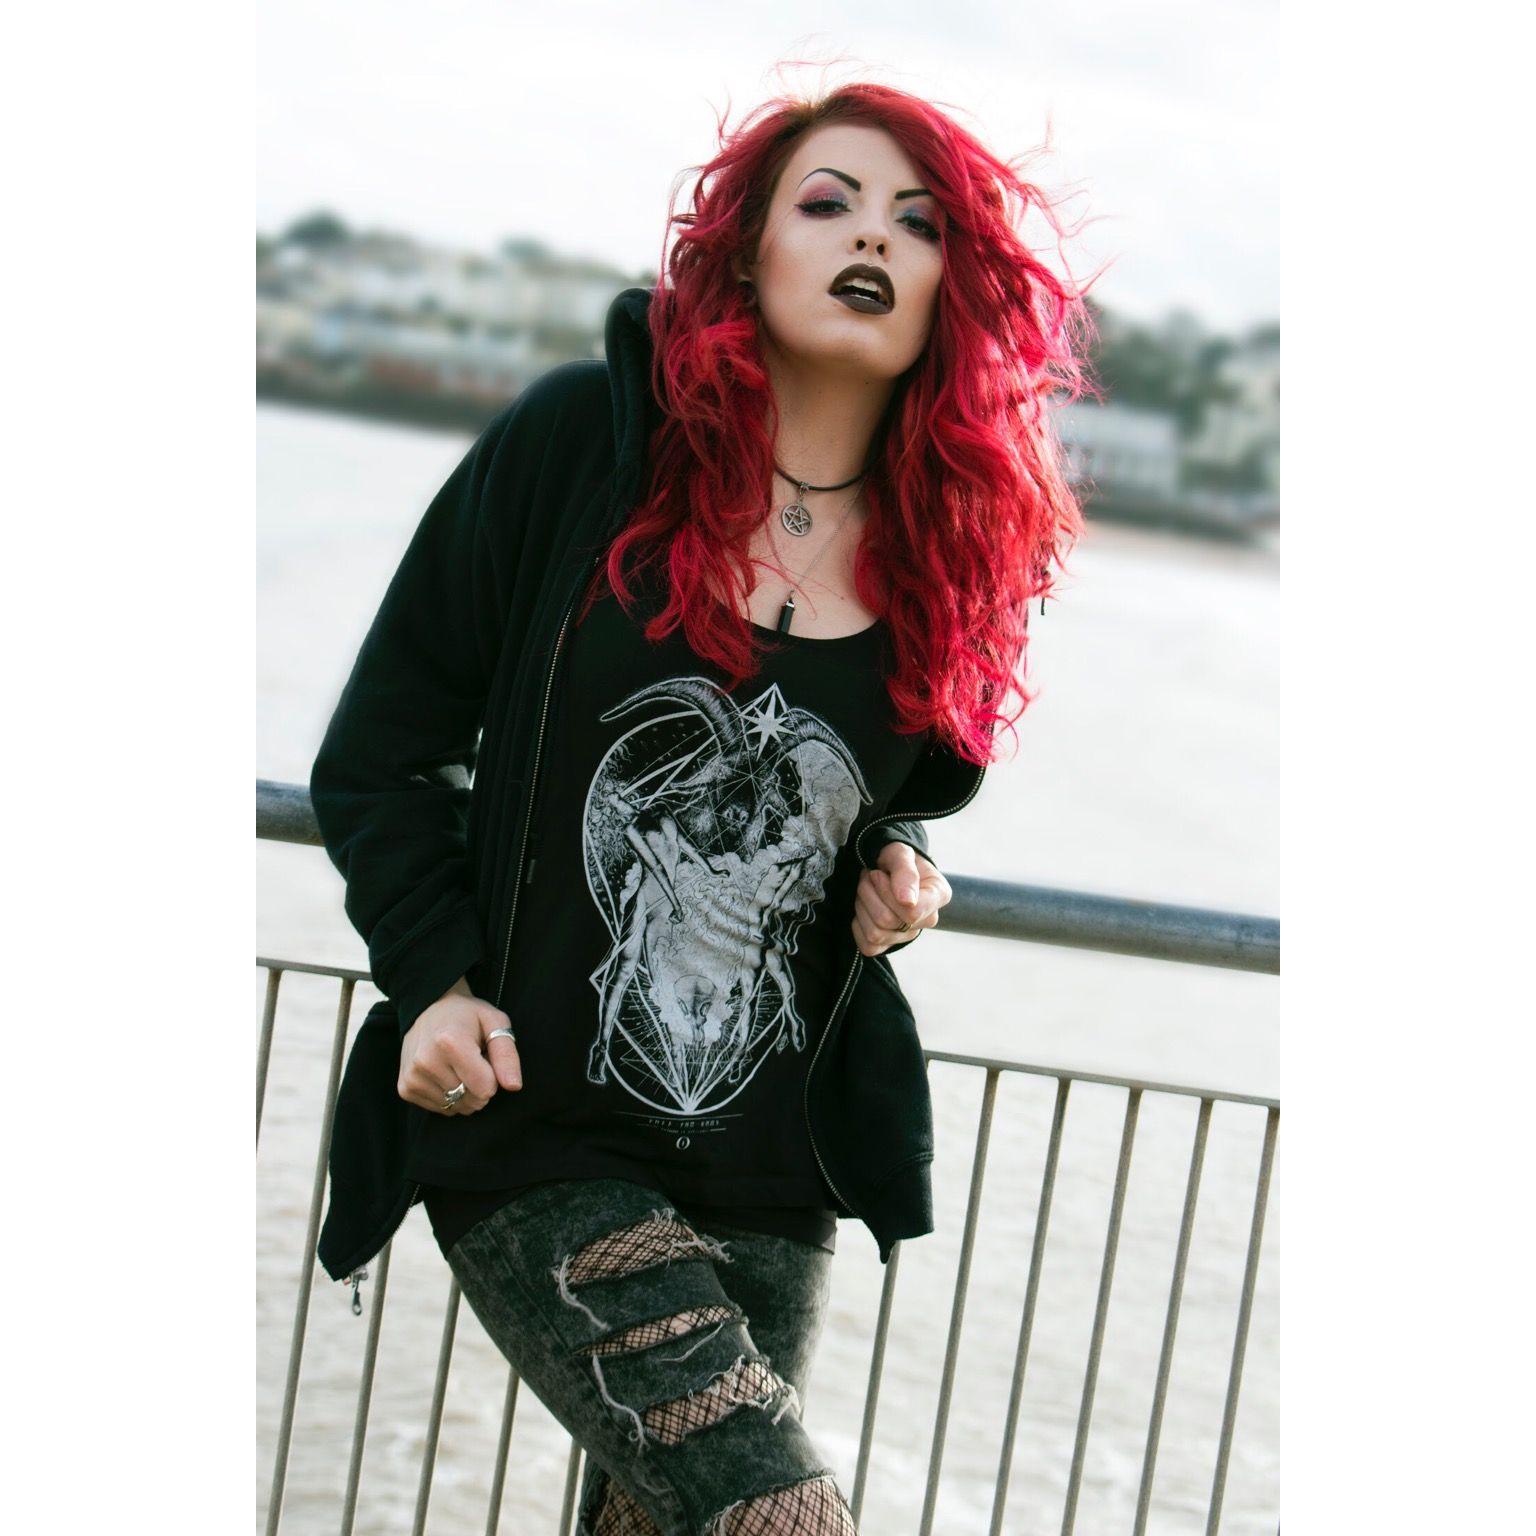 Punk and grunge